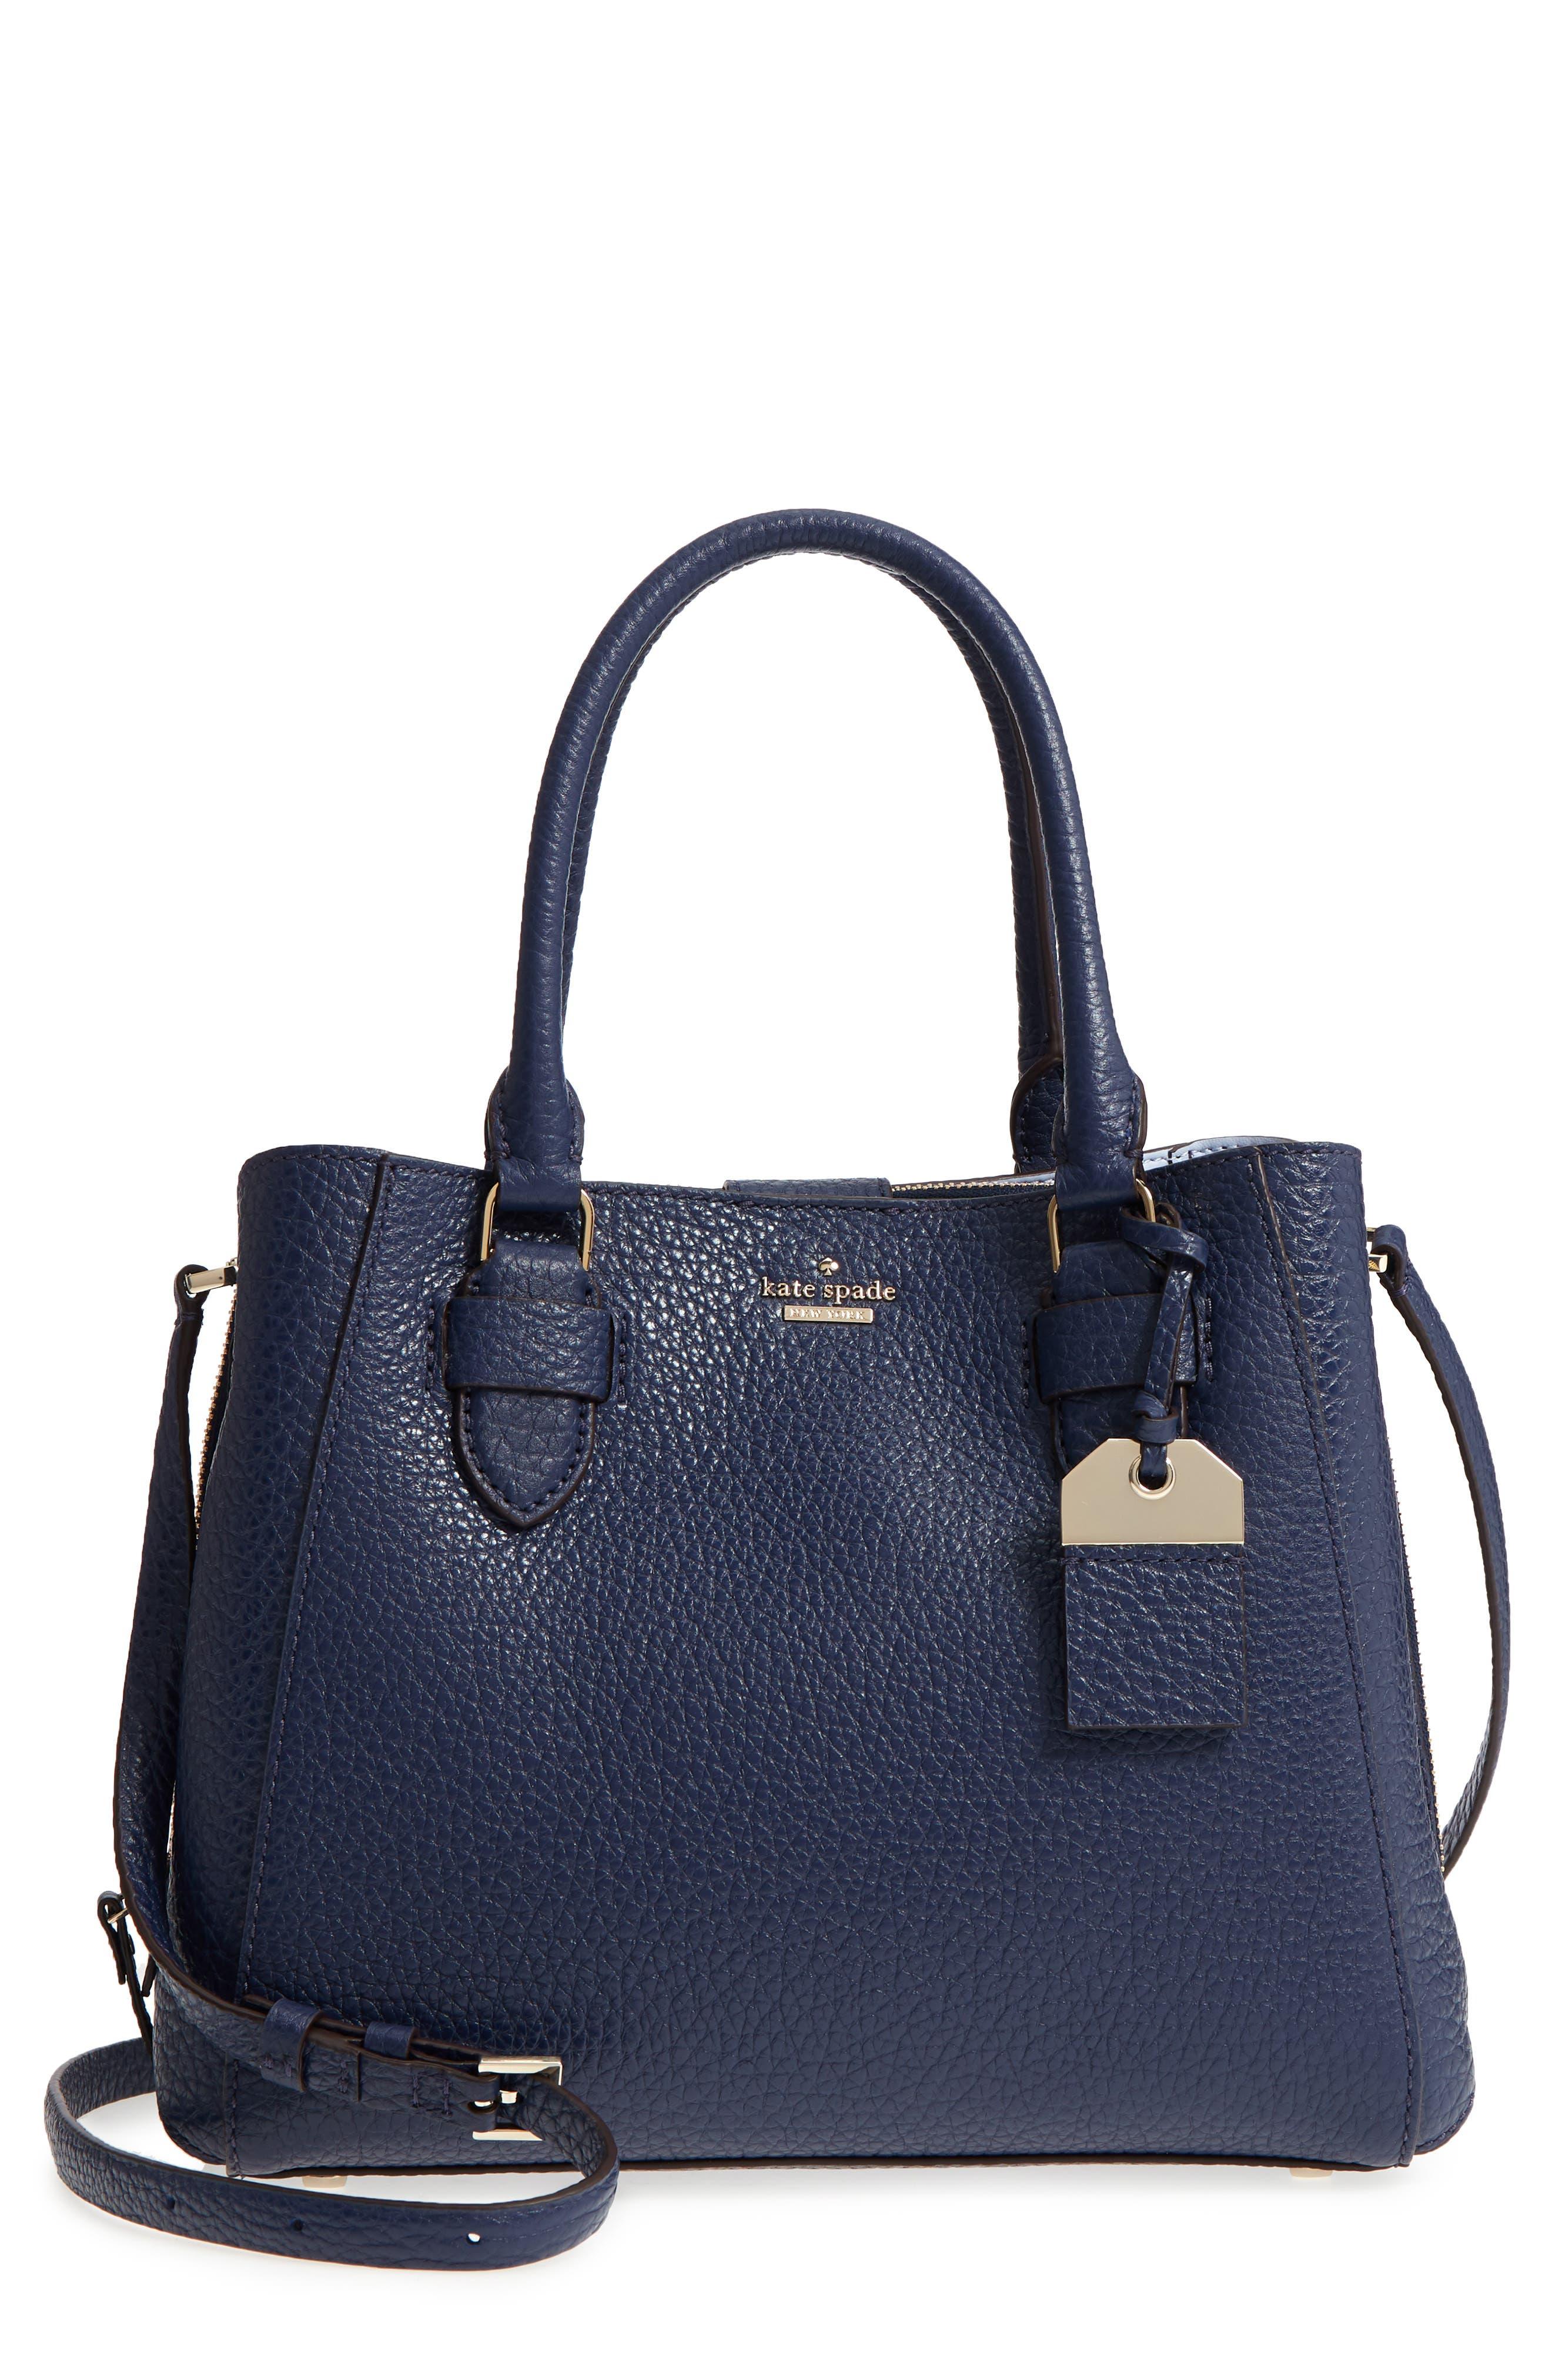 Main Image - kate spade new york carter street - aliana leather satchel